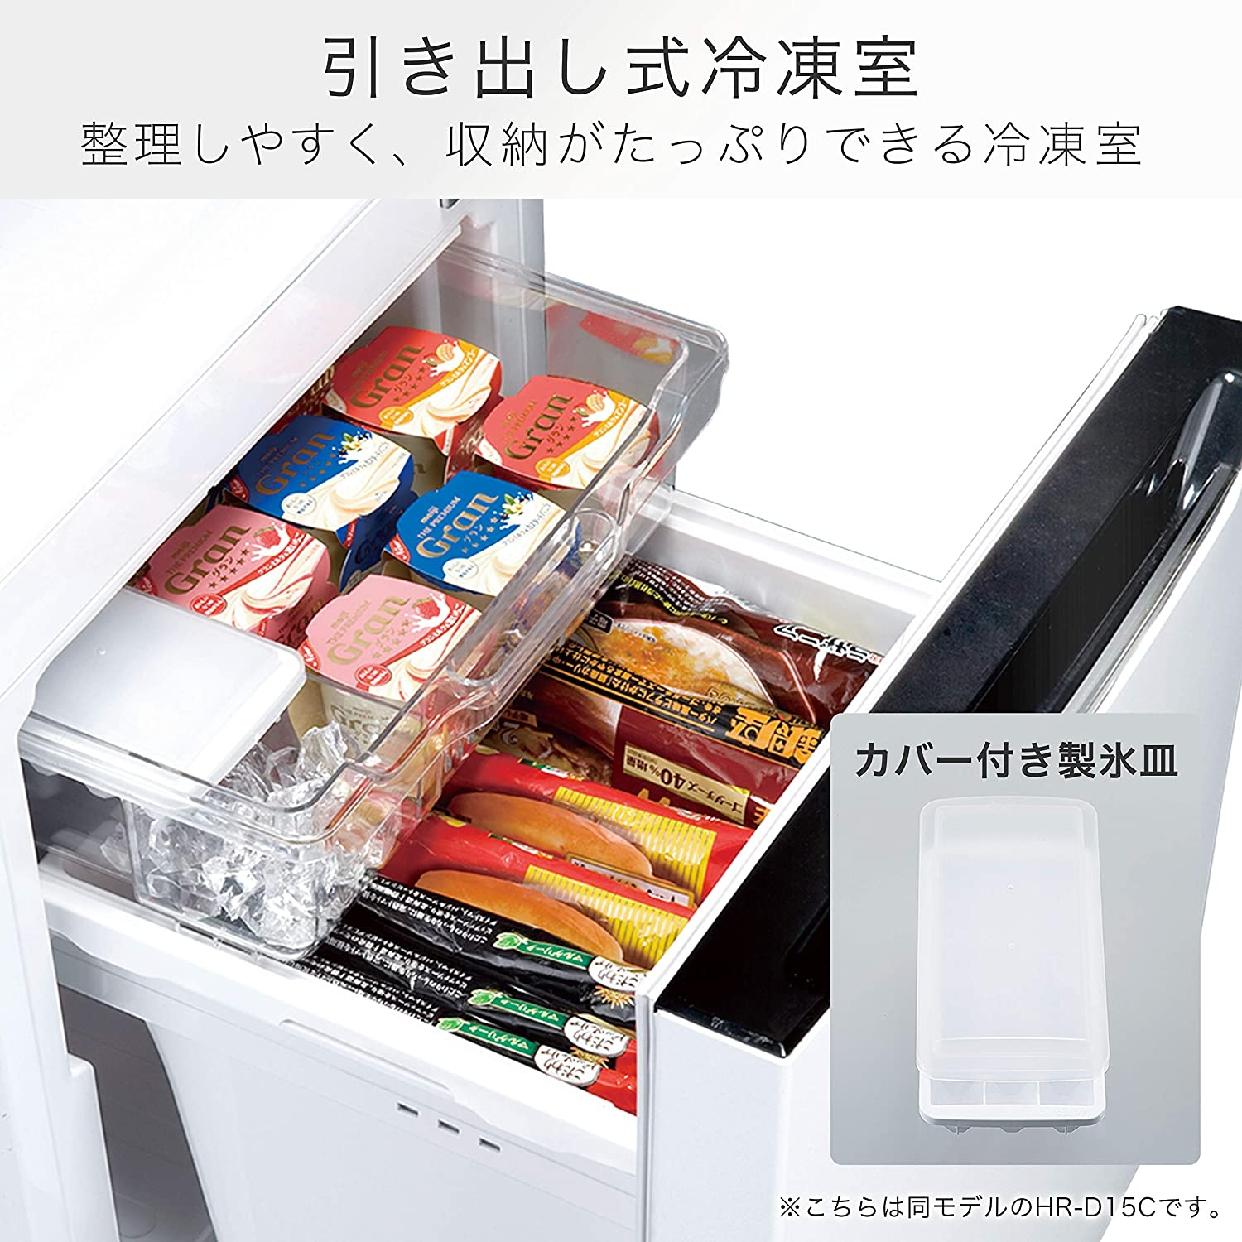 Hisense(ハイセンス)150L 冷凍冷蔵庫 HR-D15Cの商品画像6